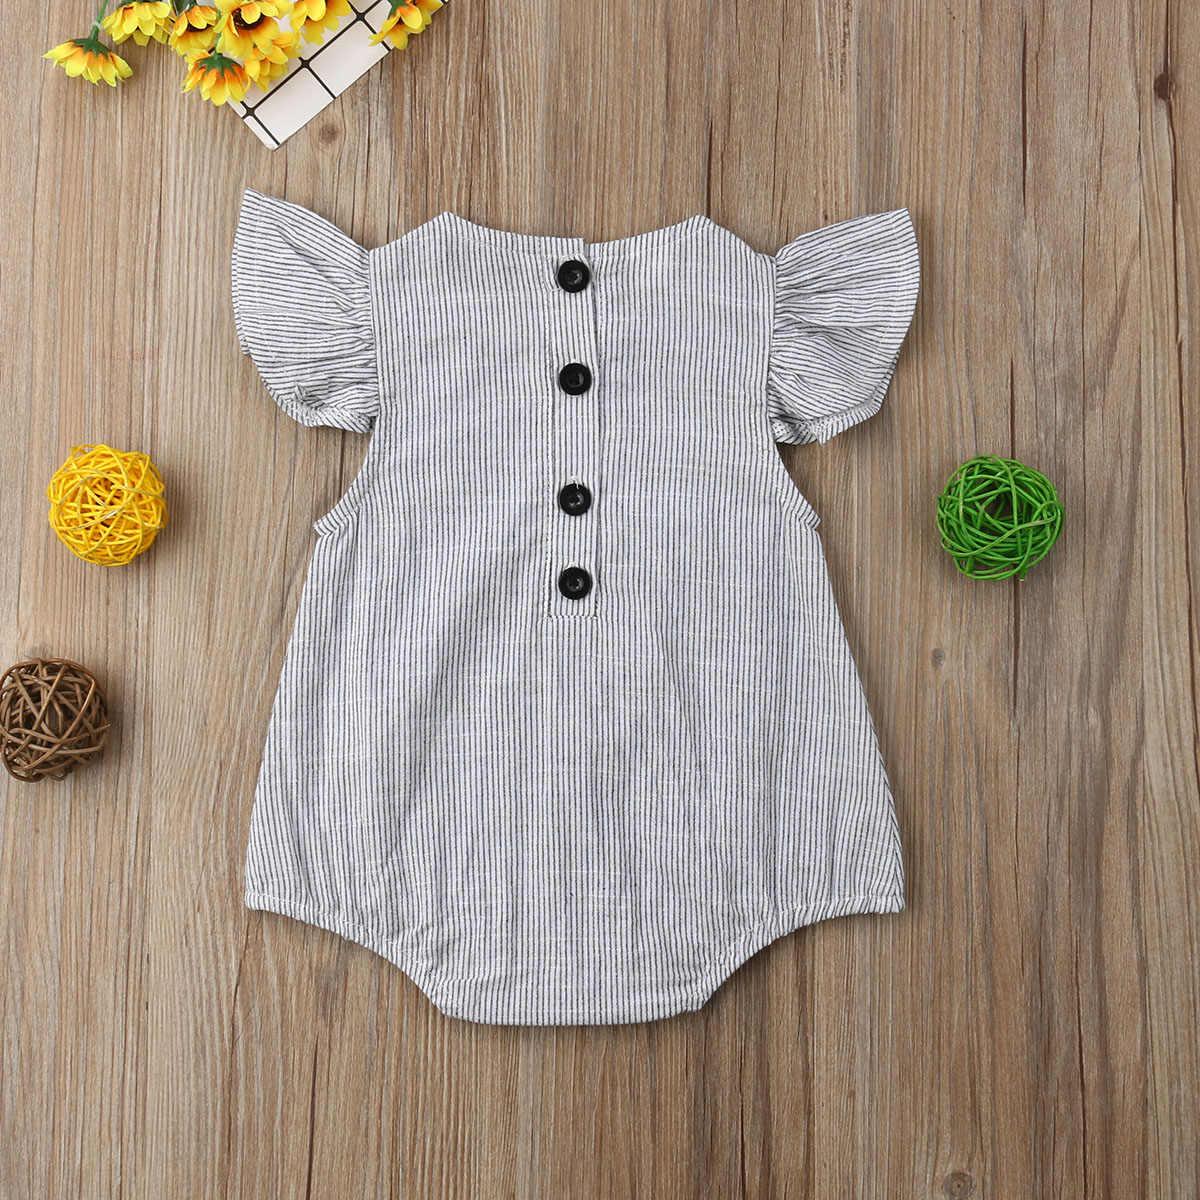 Pasgeboren Baby Romper Peuter Baby Meisje Jongen Kleding Ruche Jumpsuit Mouwloze Gestreepte Outfits Zomer Sunsuit 0-18M